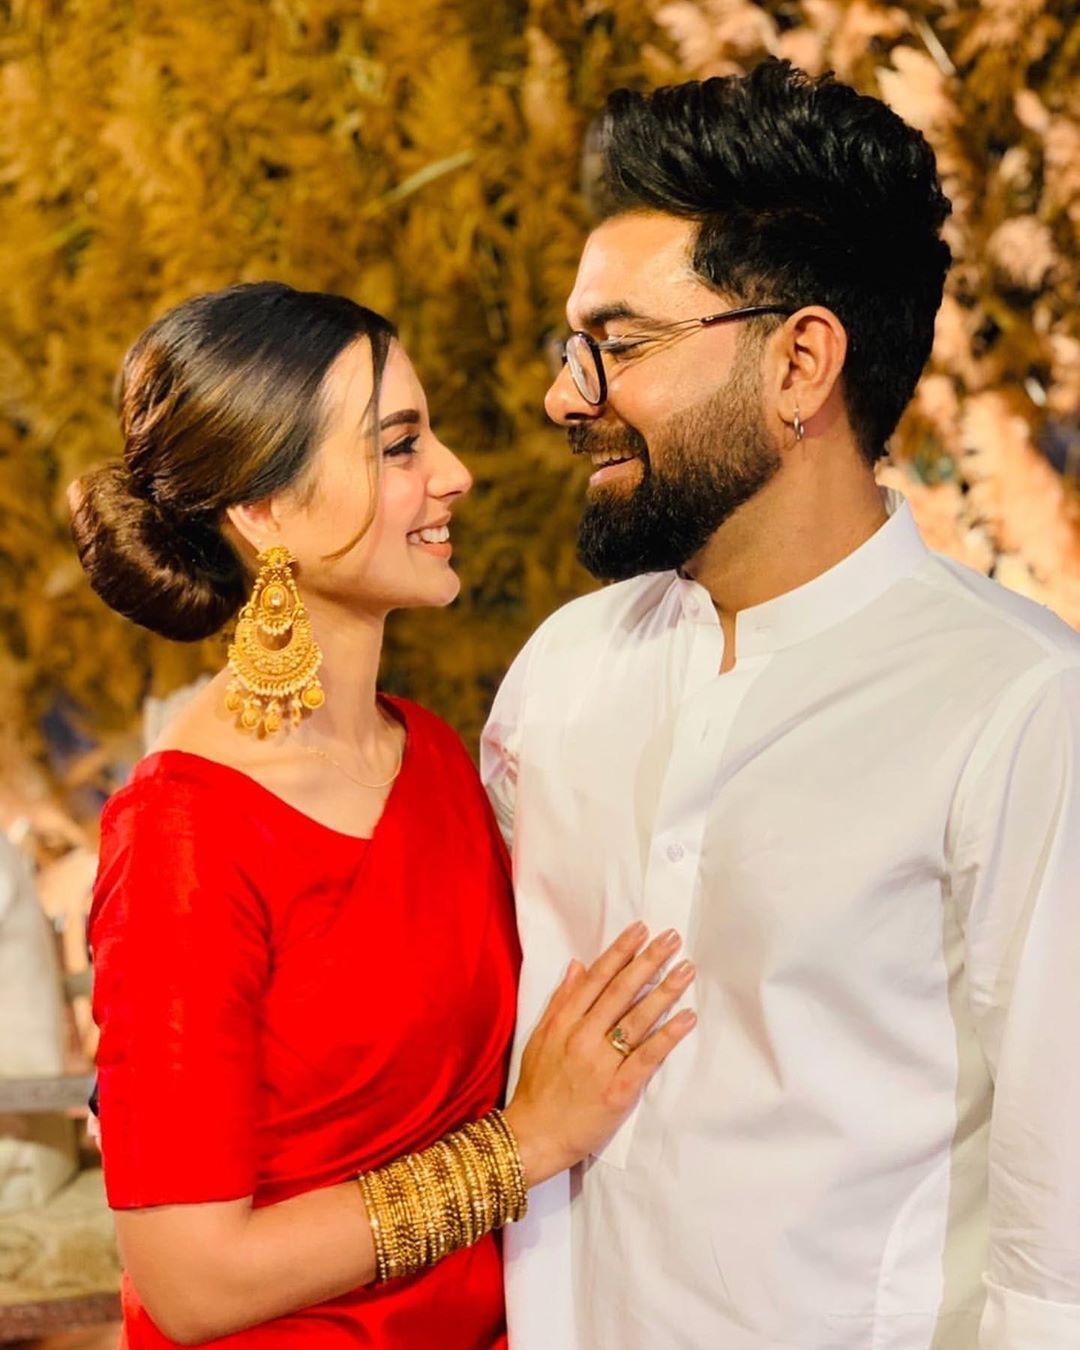 Zara Noor, Asad Siddique, Yasir Hussain and Iqra Aziz Clicks from Wedding of Sadia Ghaffar